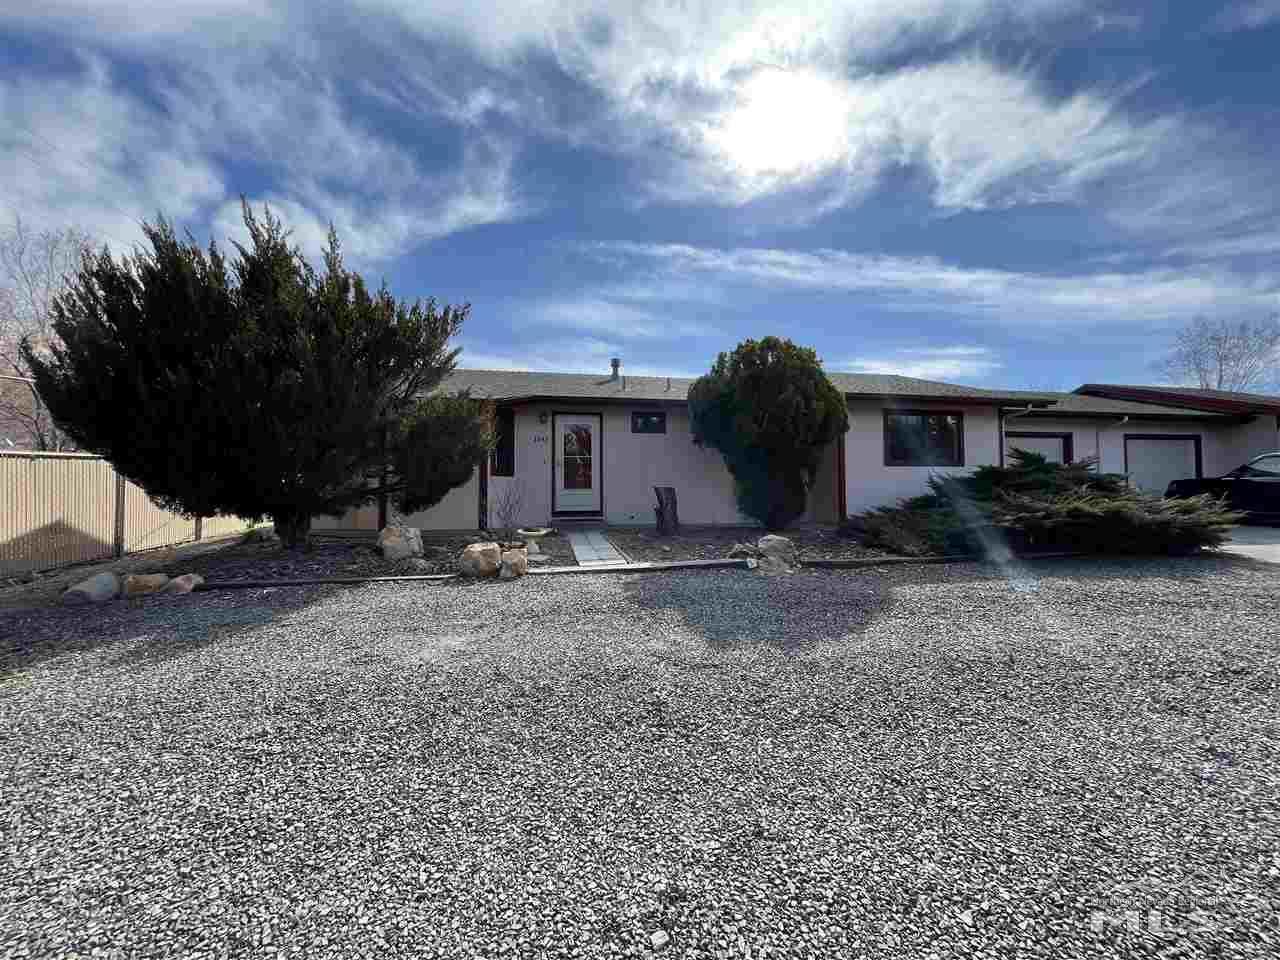 Image for 1540 Geiger Grade, Reno, NV 89521